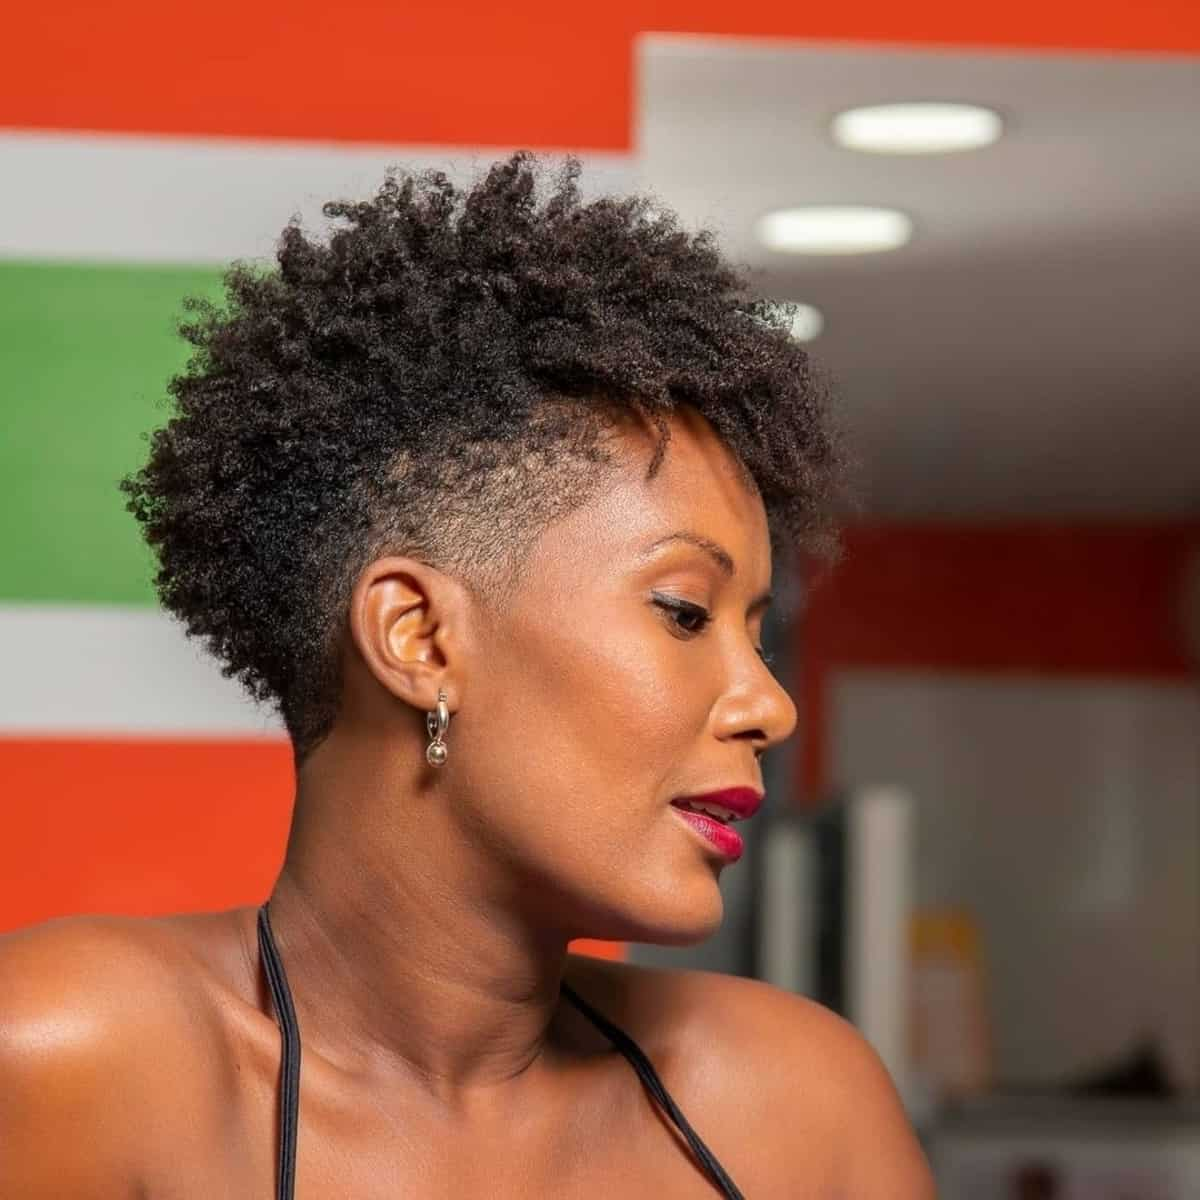 Taper fade for natural curls